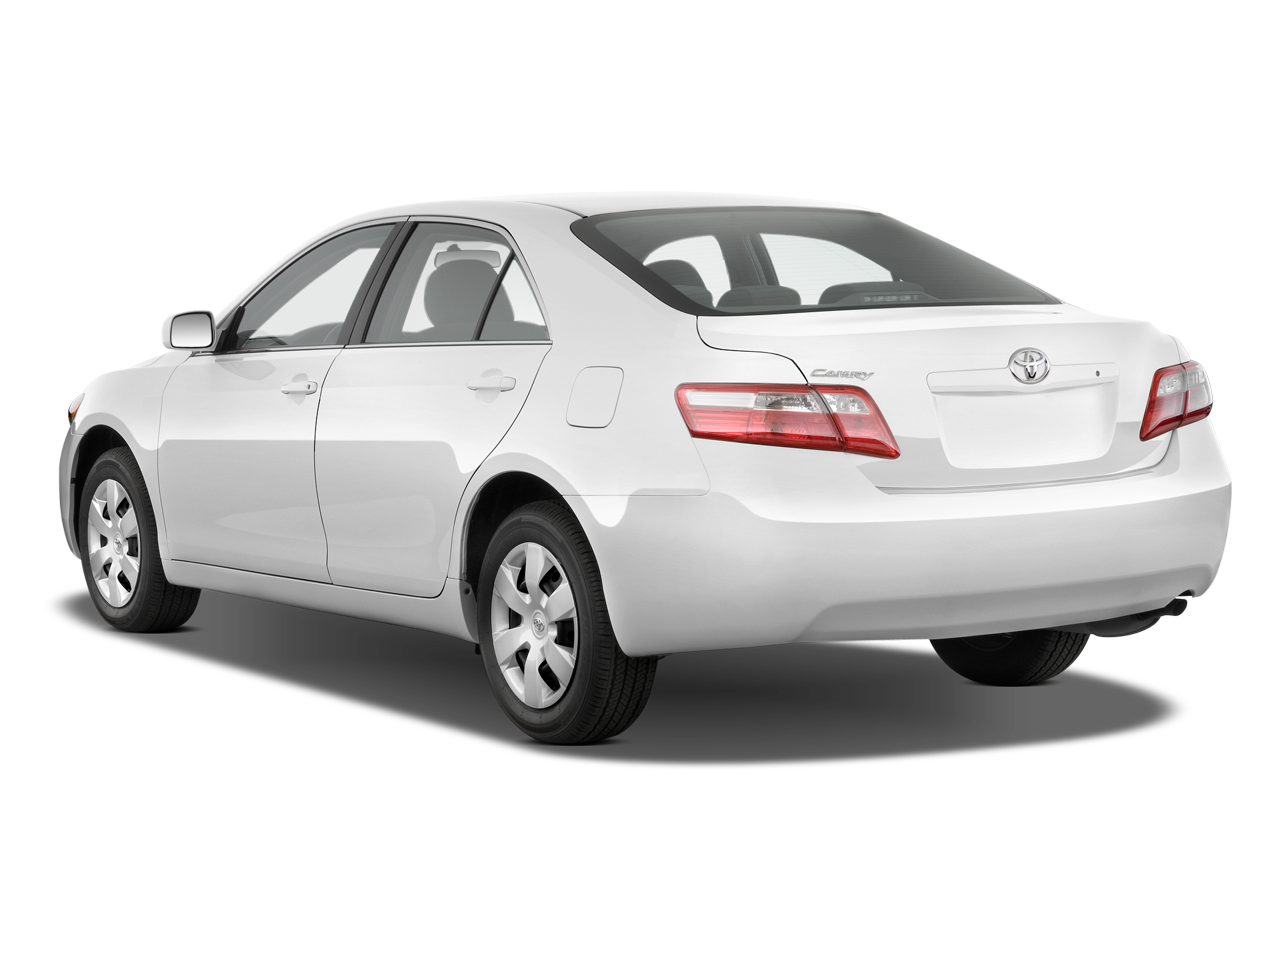 2009 Toyota Camry Xle Toyota Midsize Sedan Review